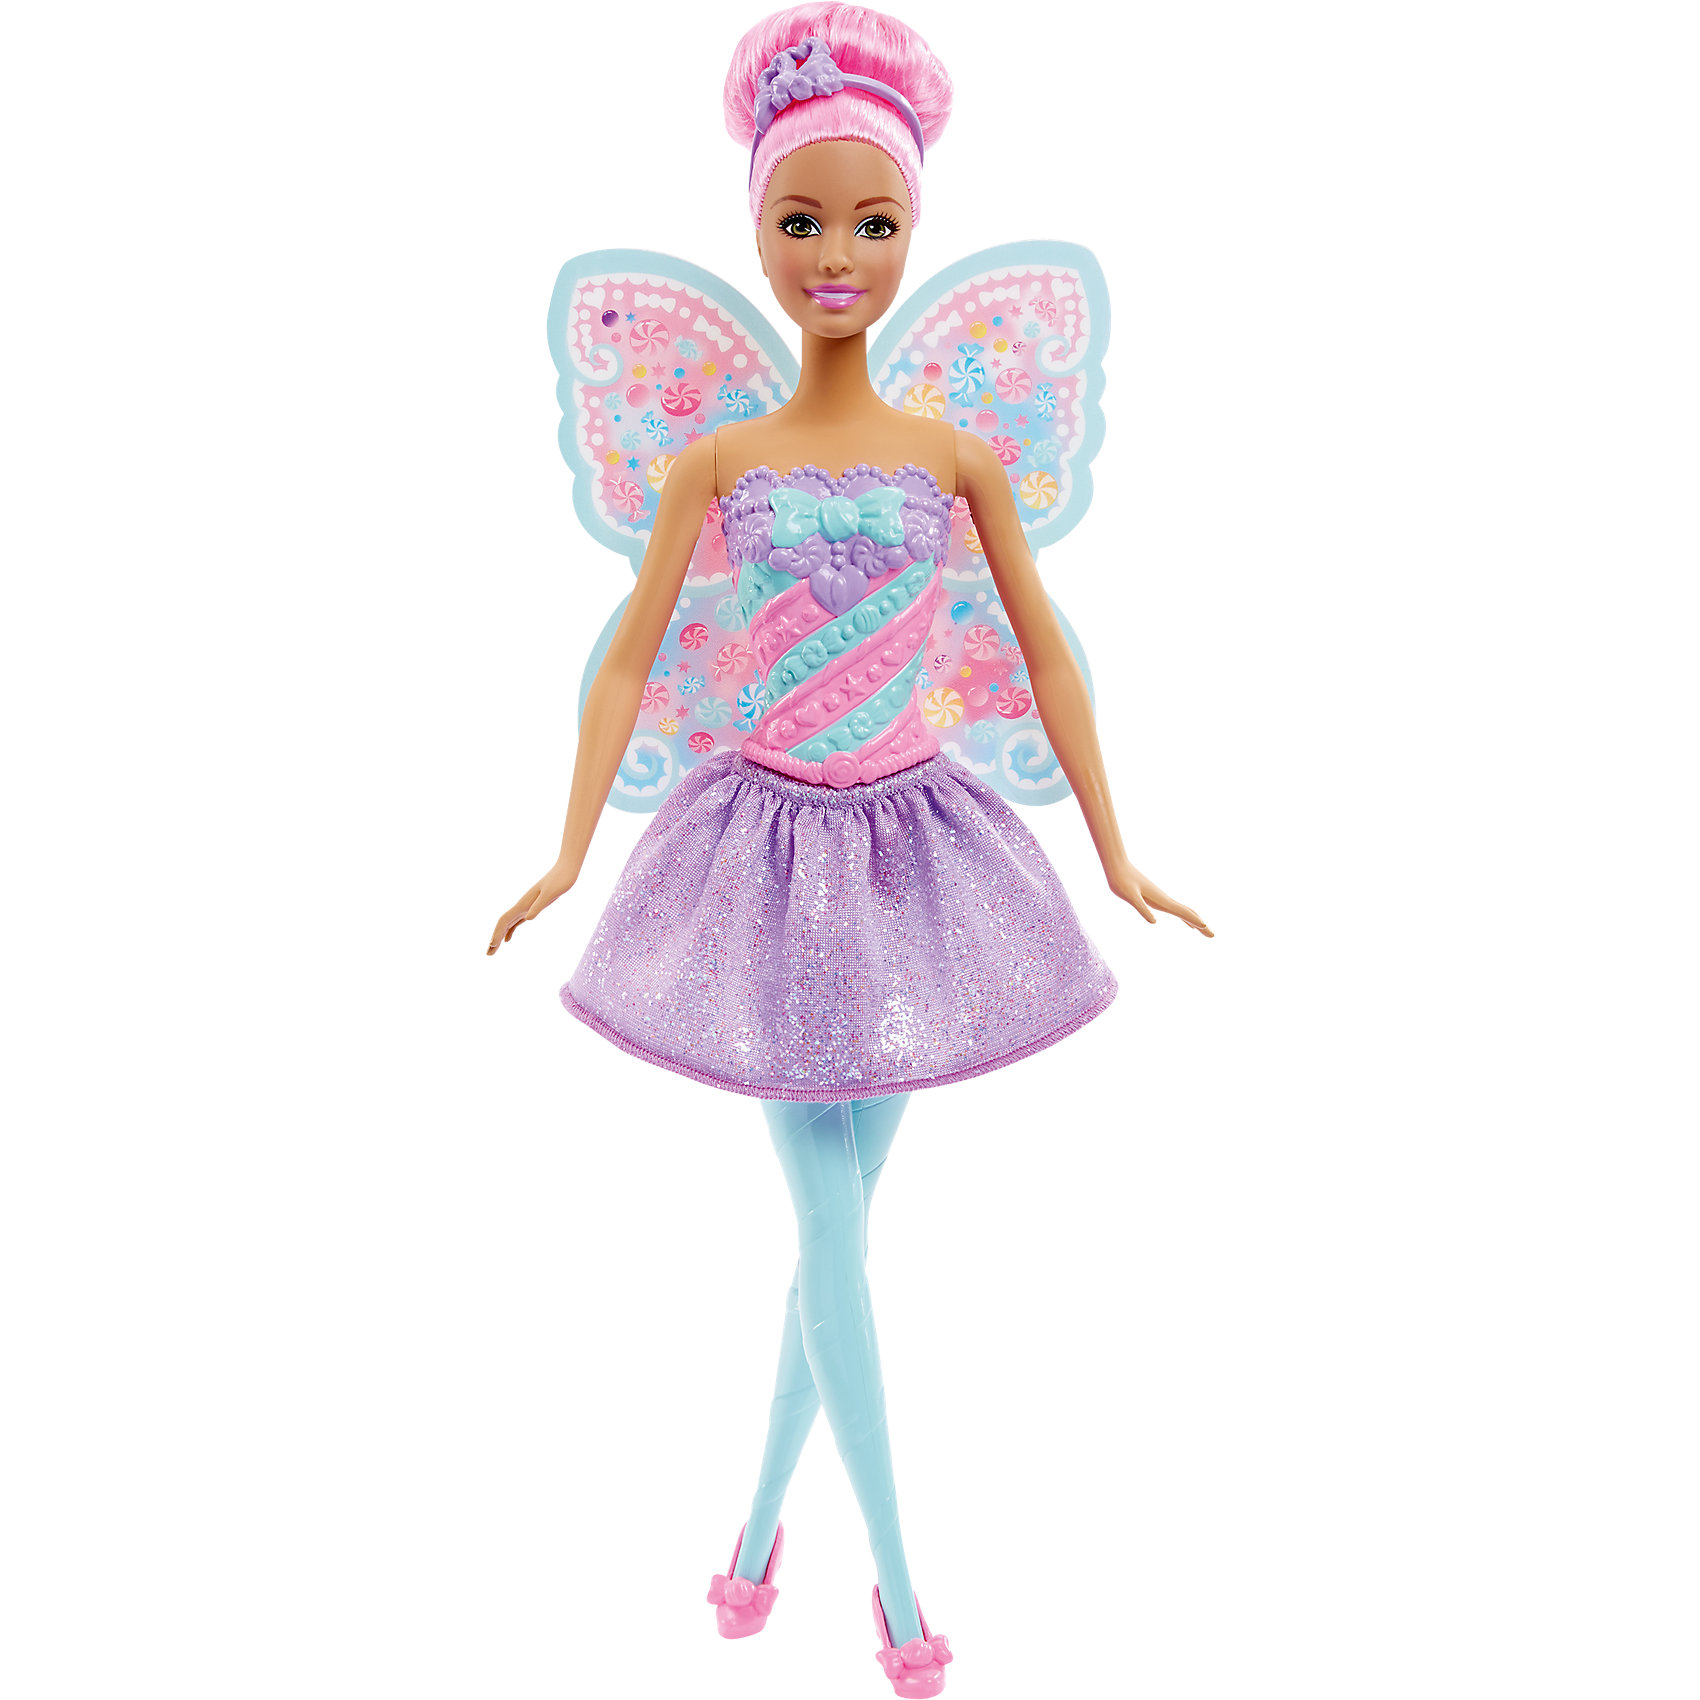 Конфетная кукла-фея Sweet, Barbie